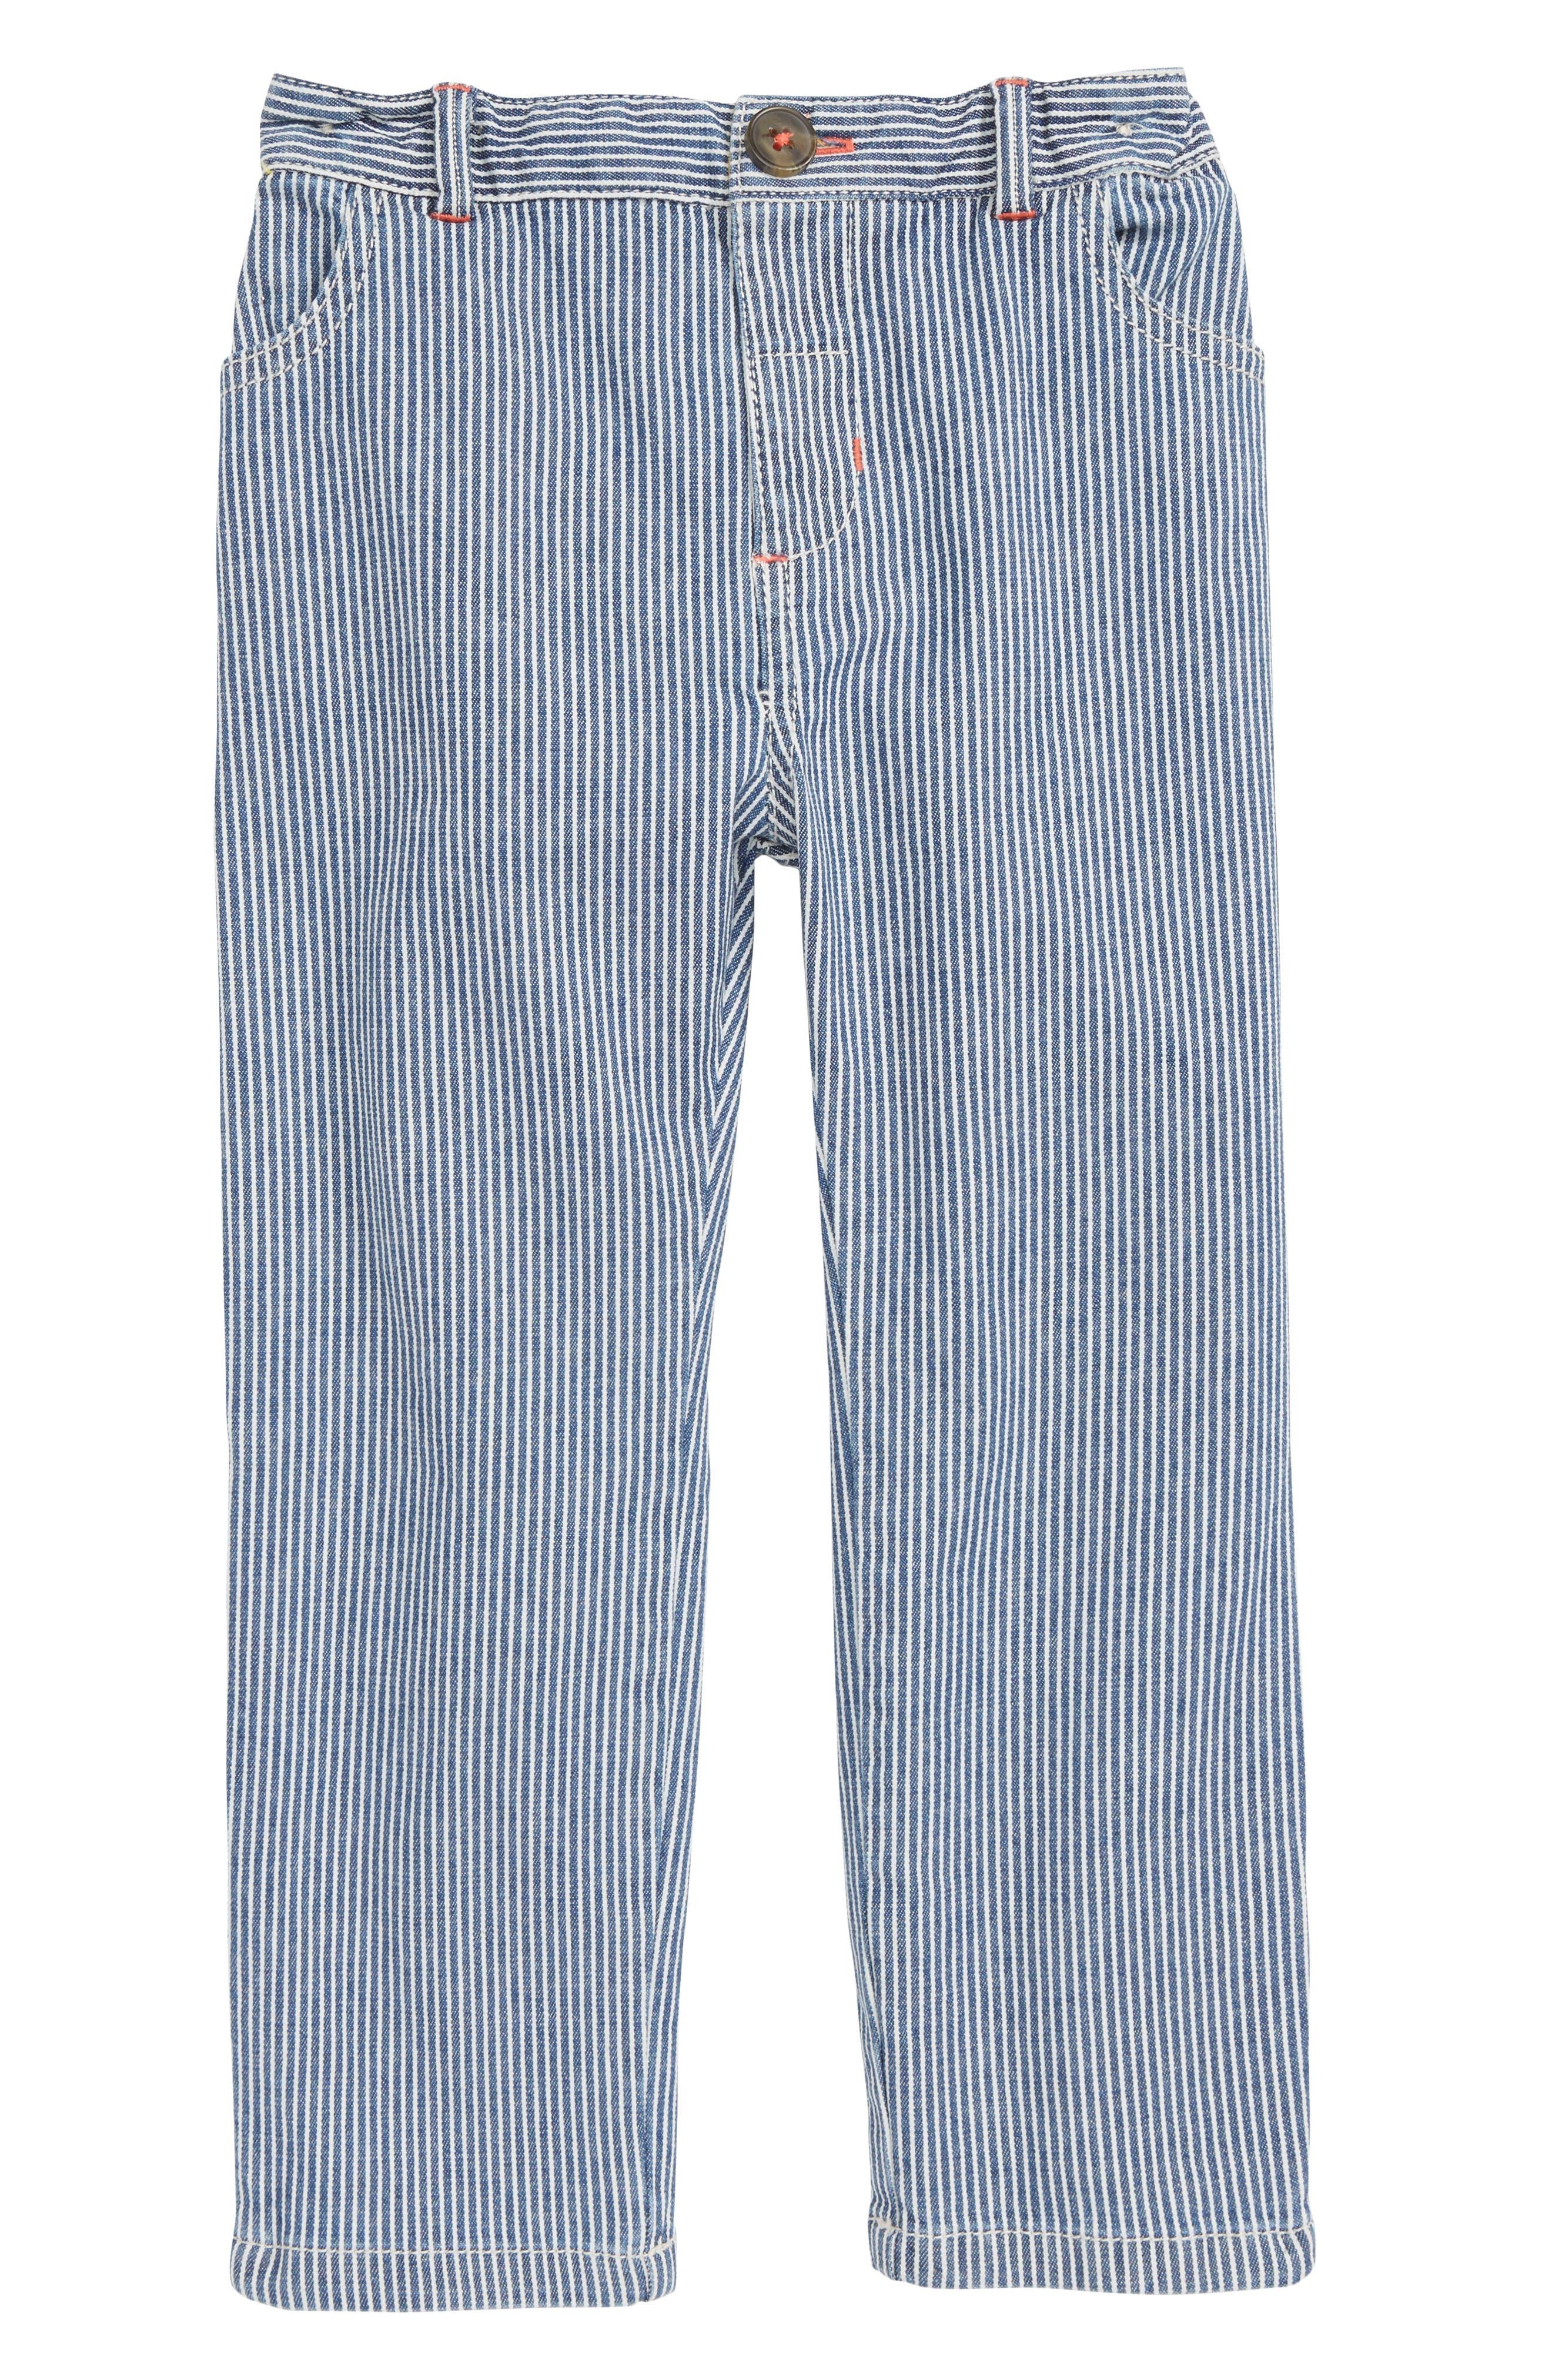 Ticking Stripe Chino Pants, Main, color, BLU DUKE BLUE TICKING